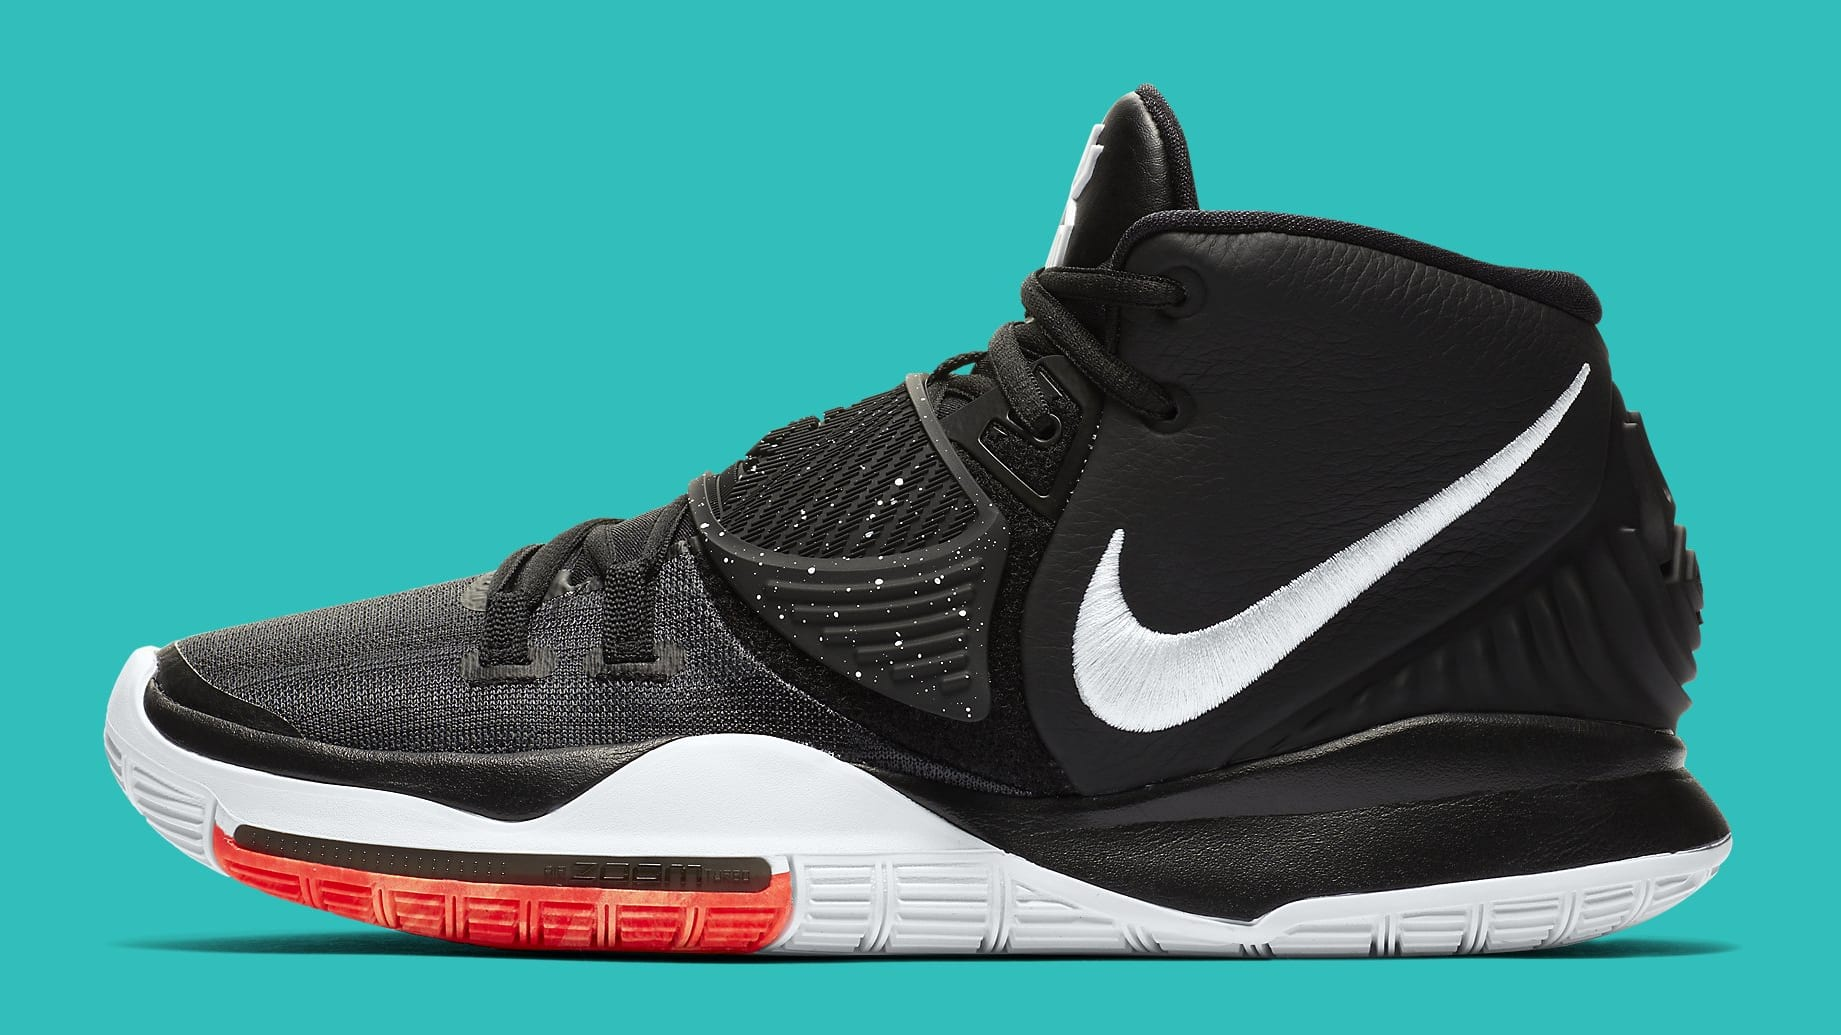 Nike Kyrie 6 Black White Release Date BQ4630-001 Medial